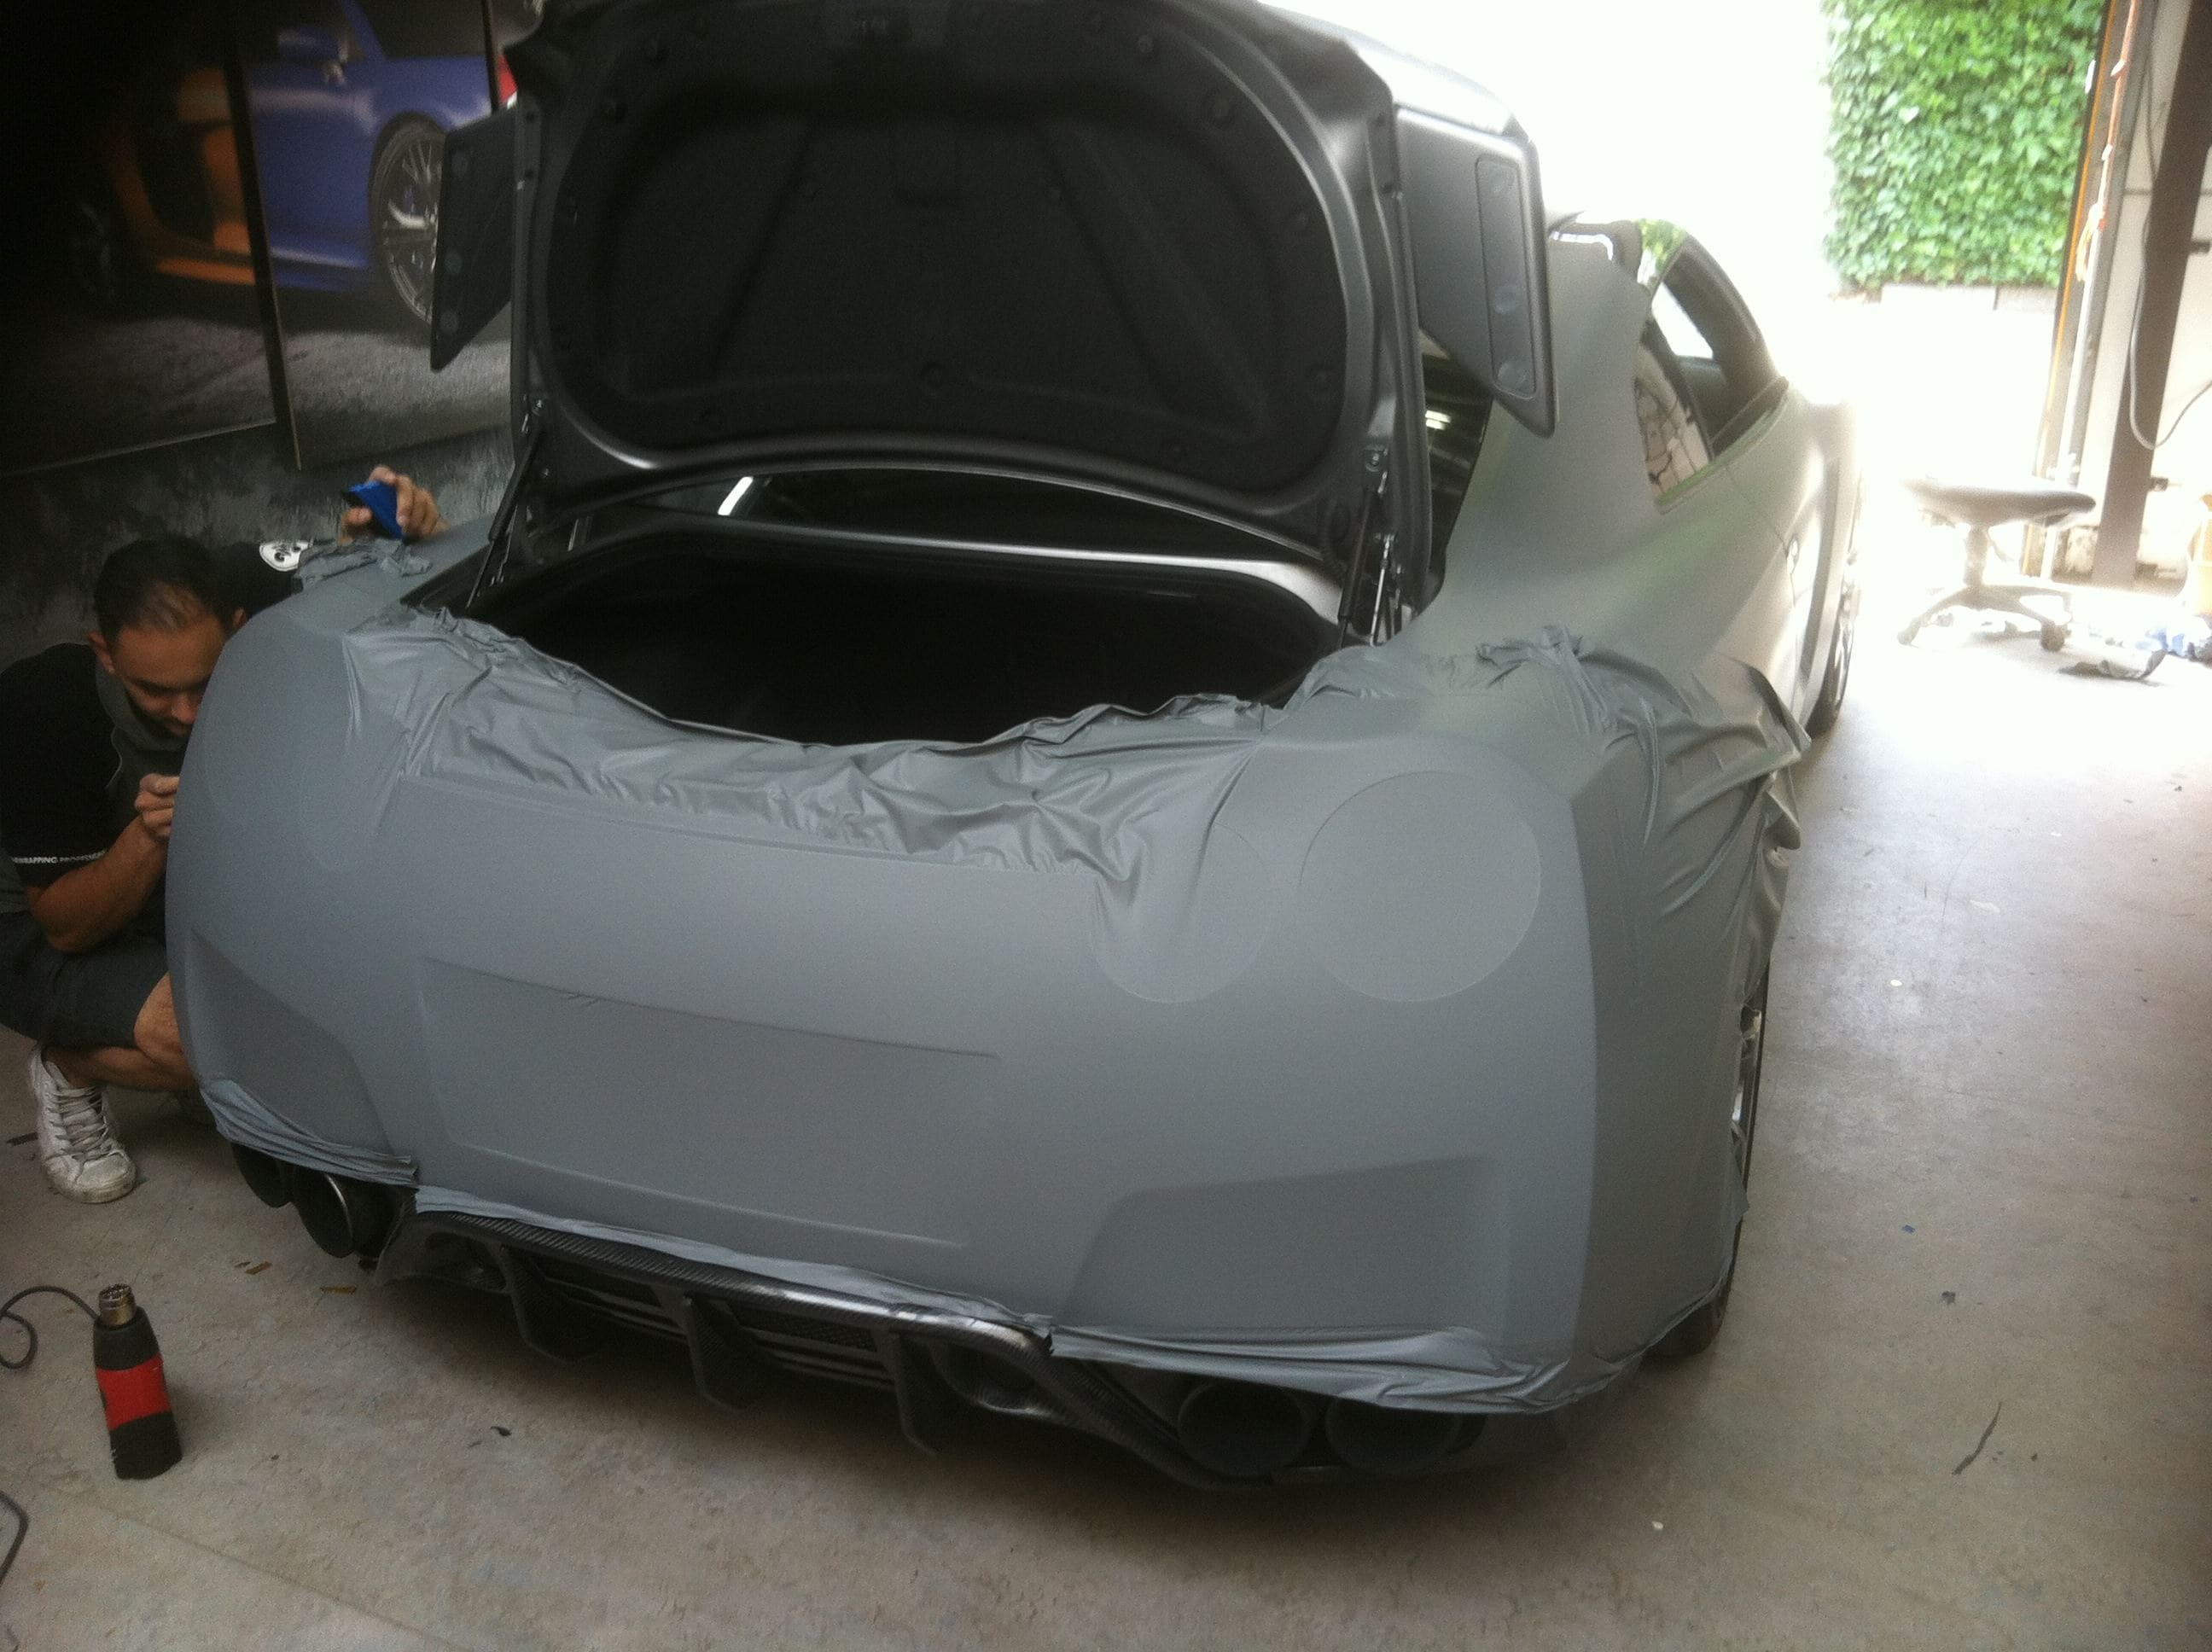 Nissan GT-R met Mat Grijze Wrap, Carwrapping door Wrapmyride.nu Foto-nr:6548, ©2020